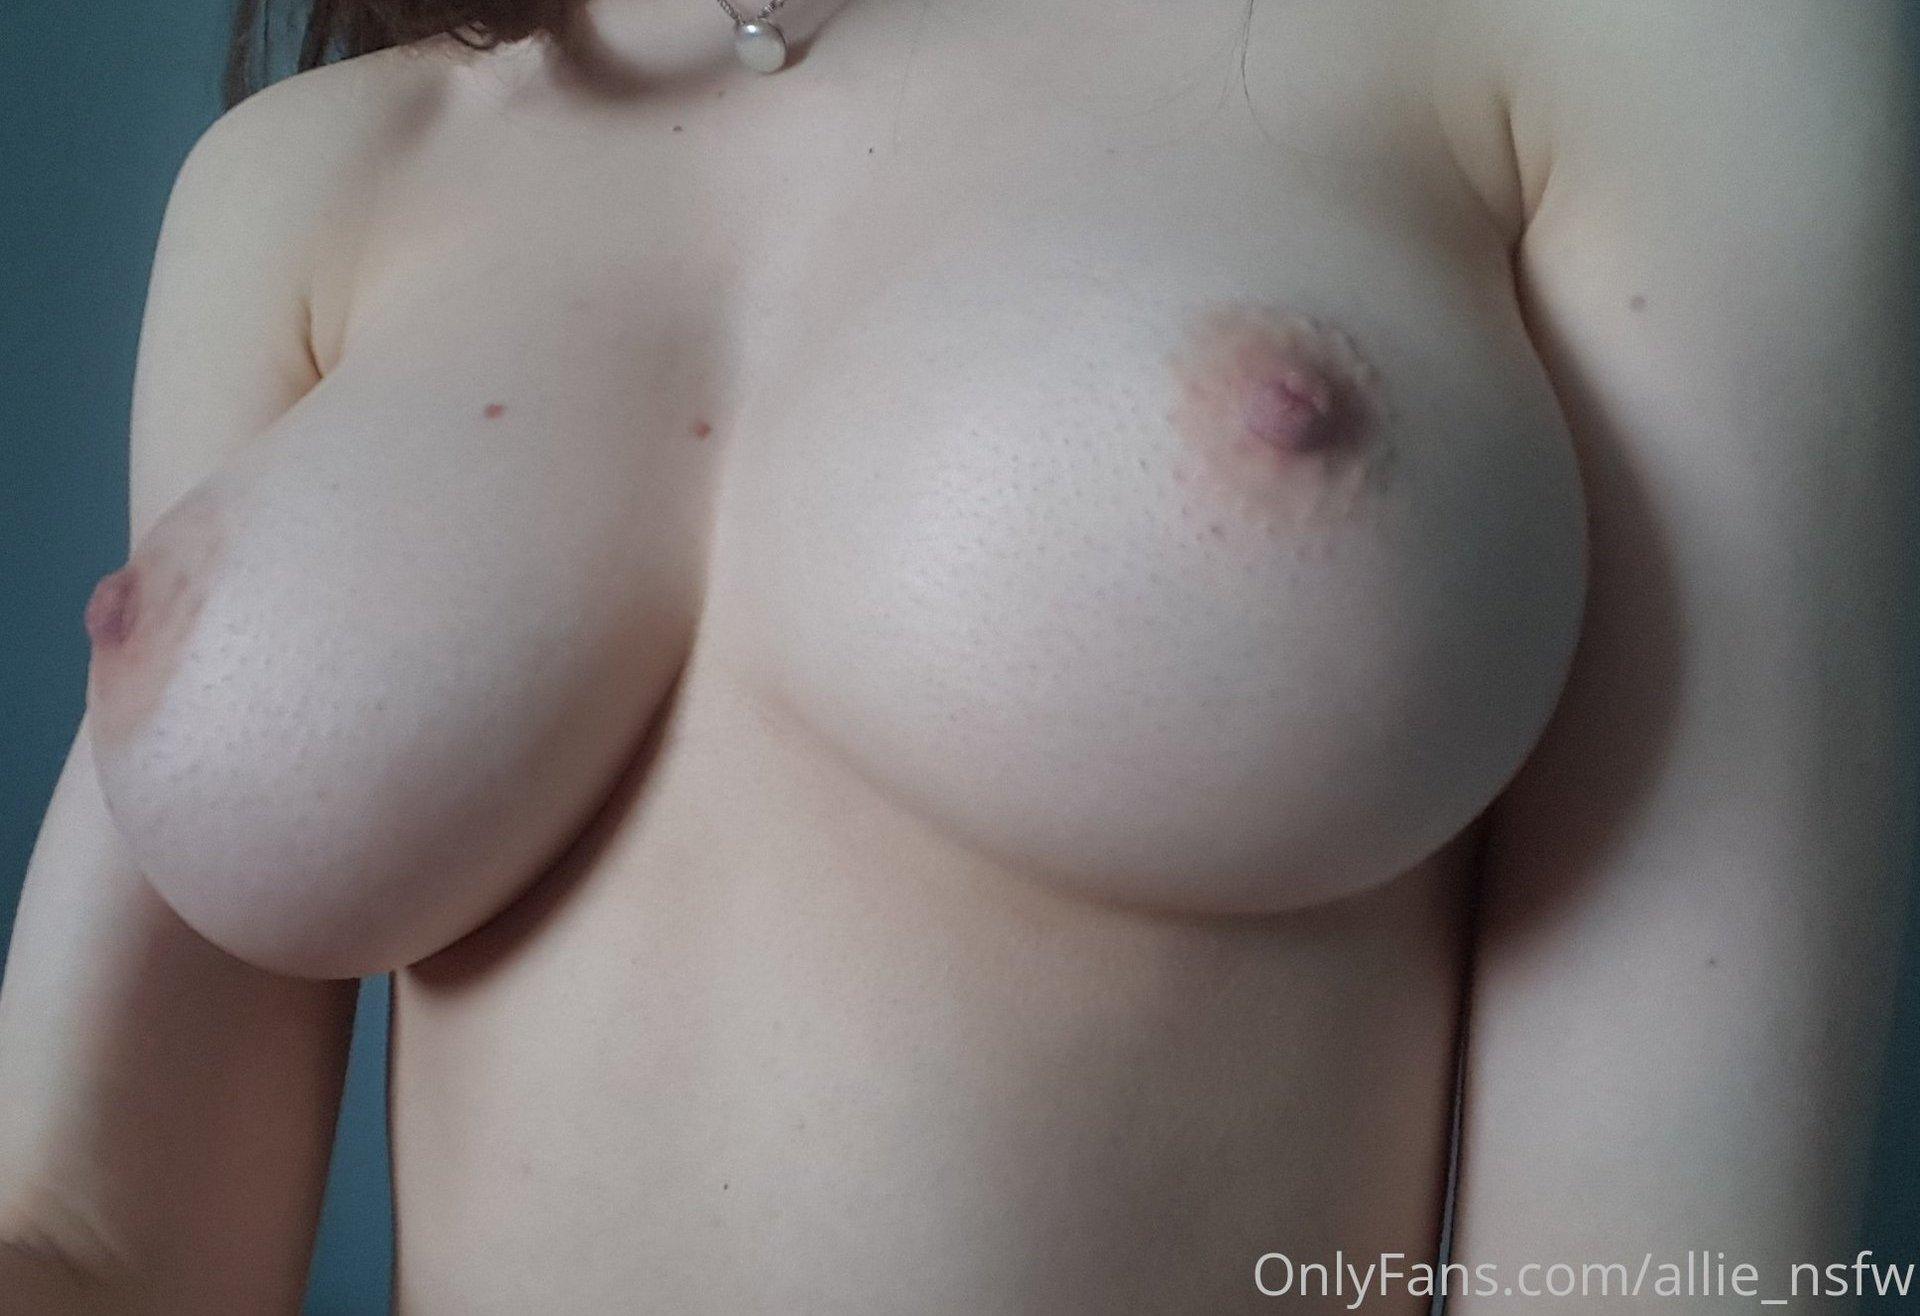 Allie Alliensfw Onlyfans Nude Leaks 0033